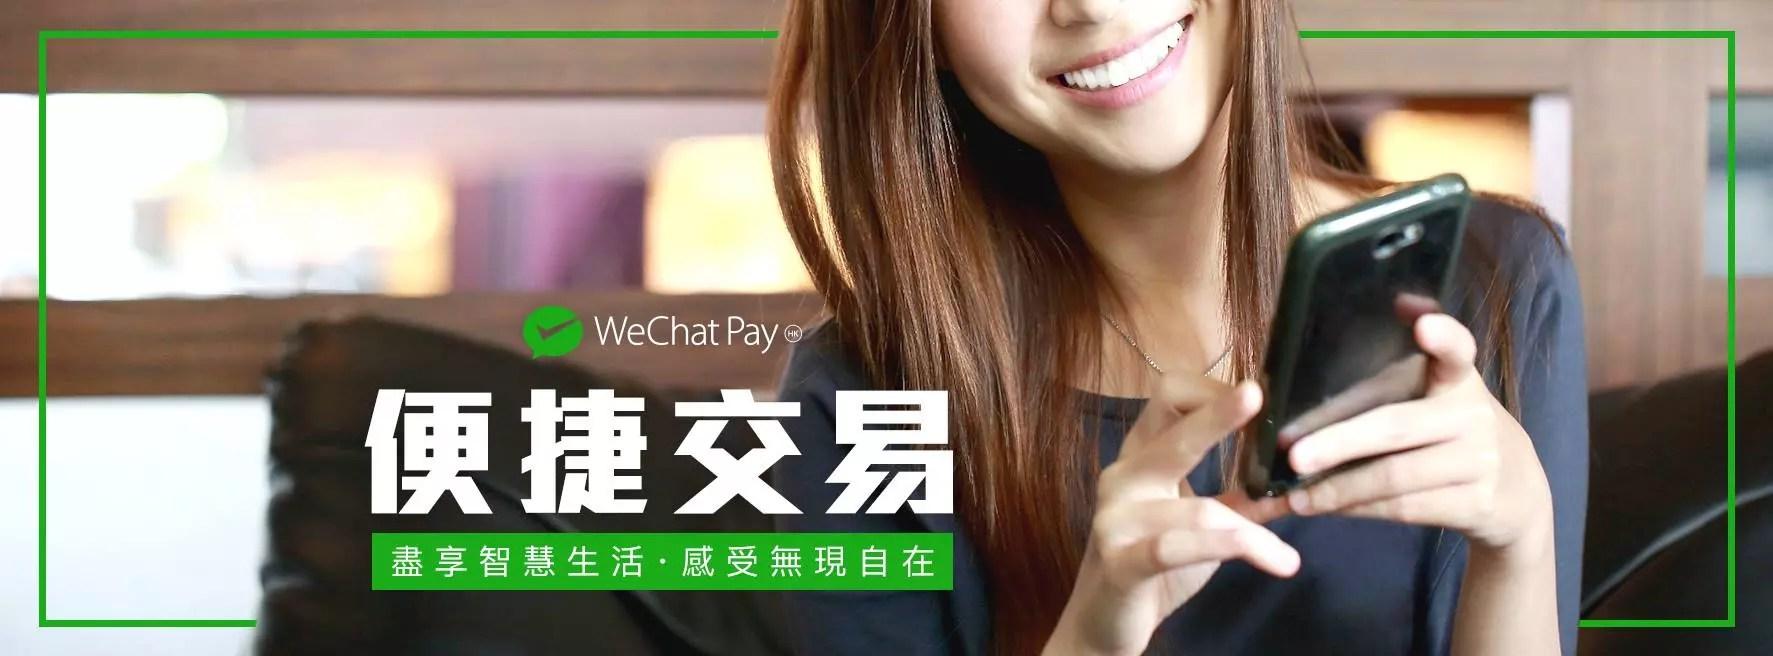 Wechat Pay HK港版wechat微信如何使用中國大陸錢包? – Today is Holiday旅行情報網